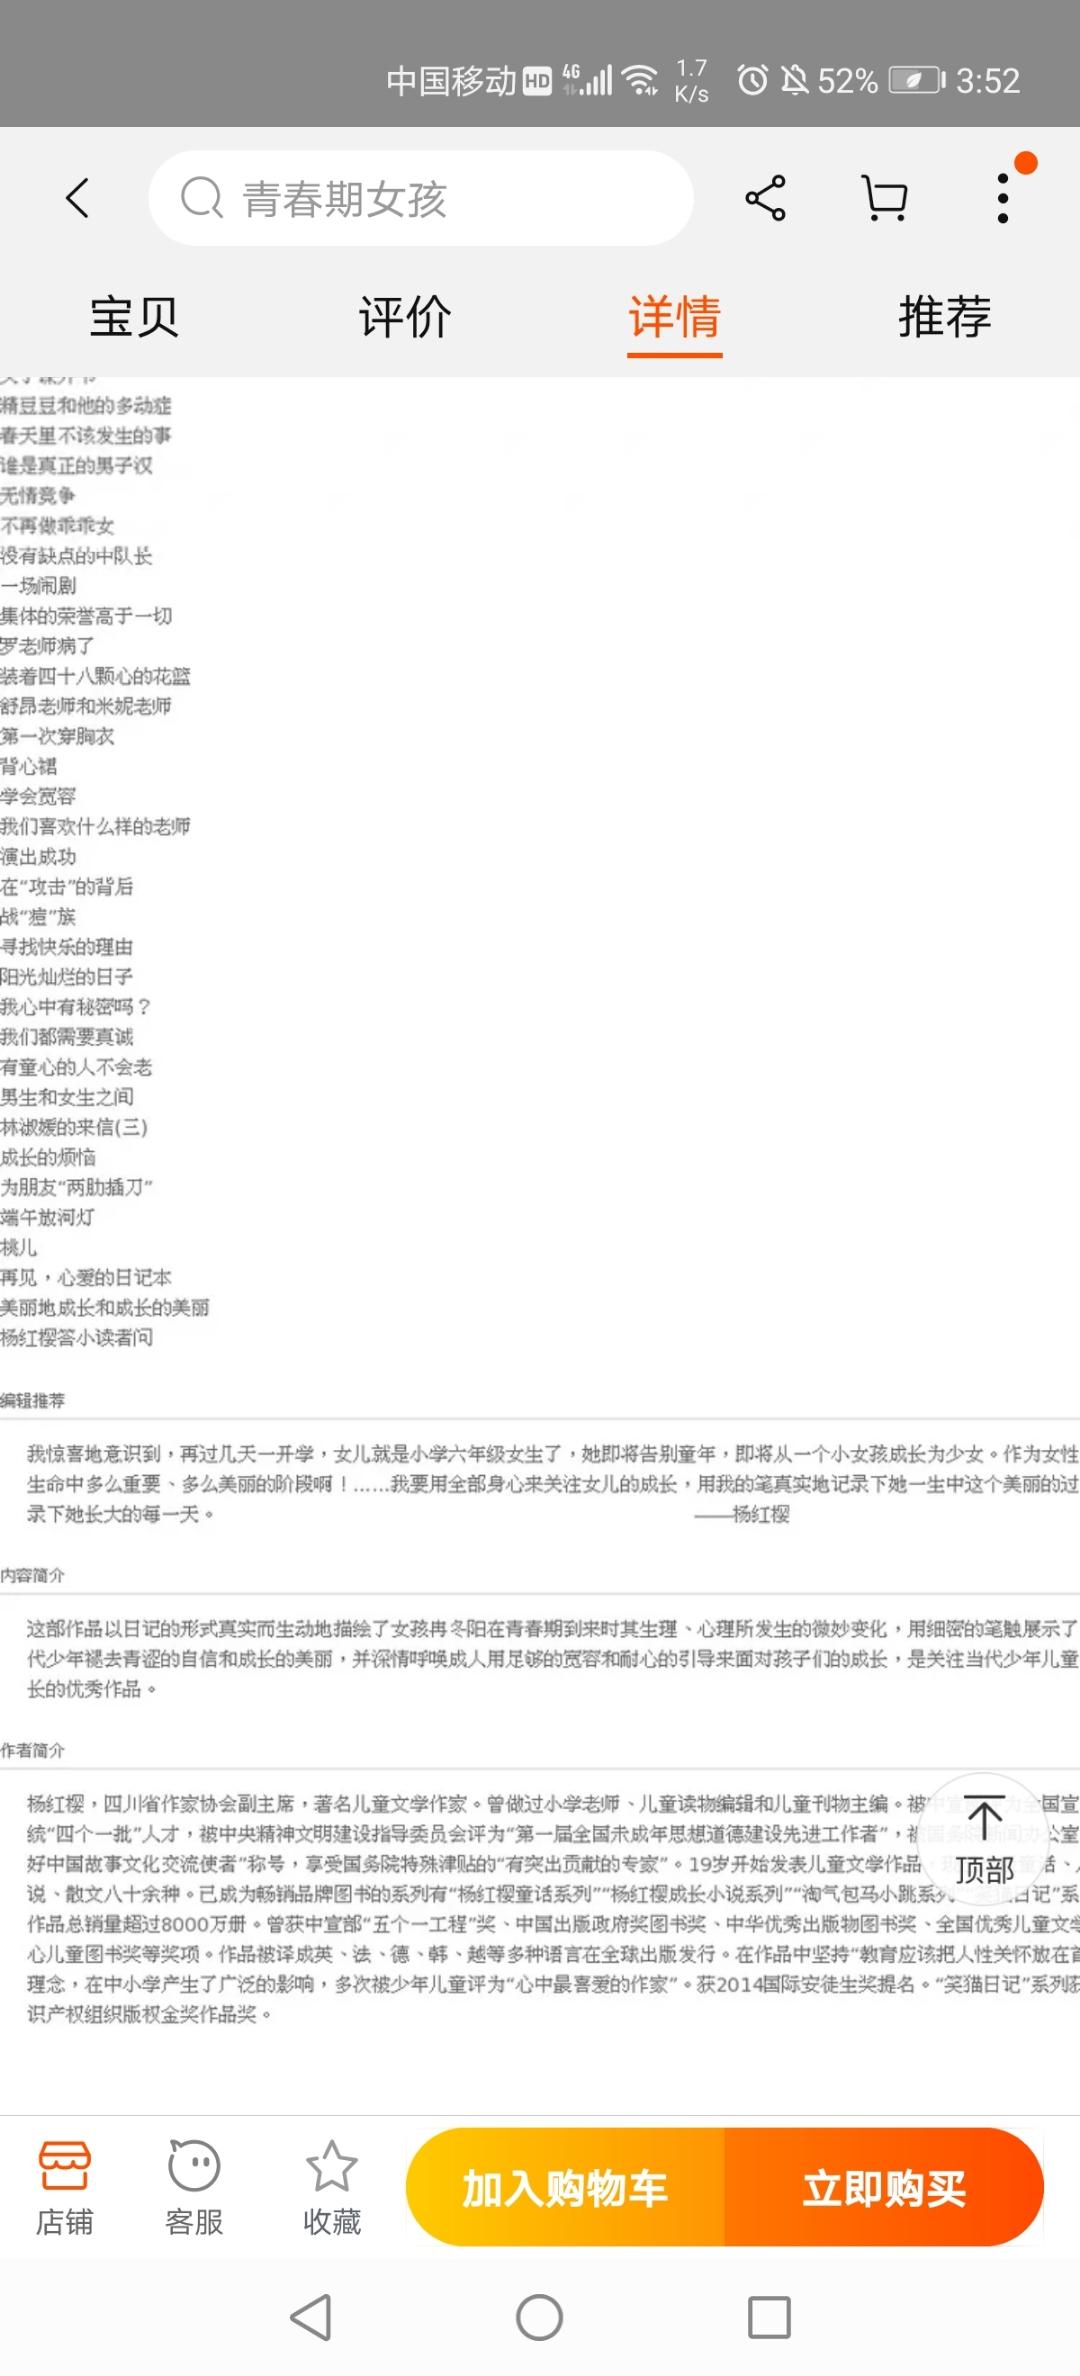 Screenshot_20200512_155221_com.taobao.taobao.jpg